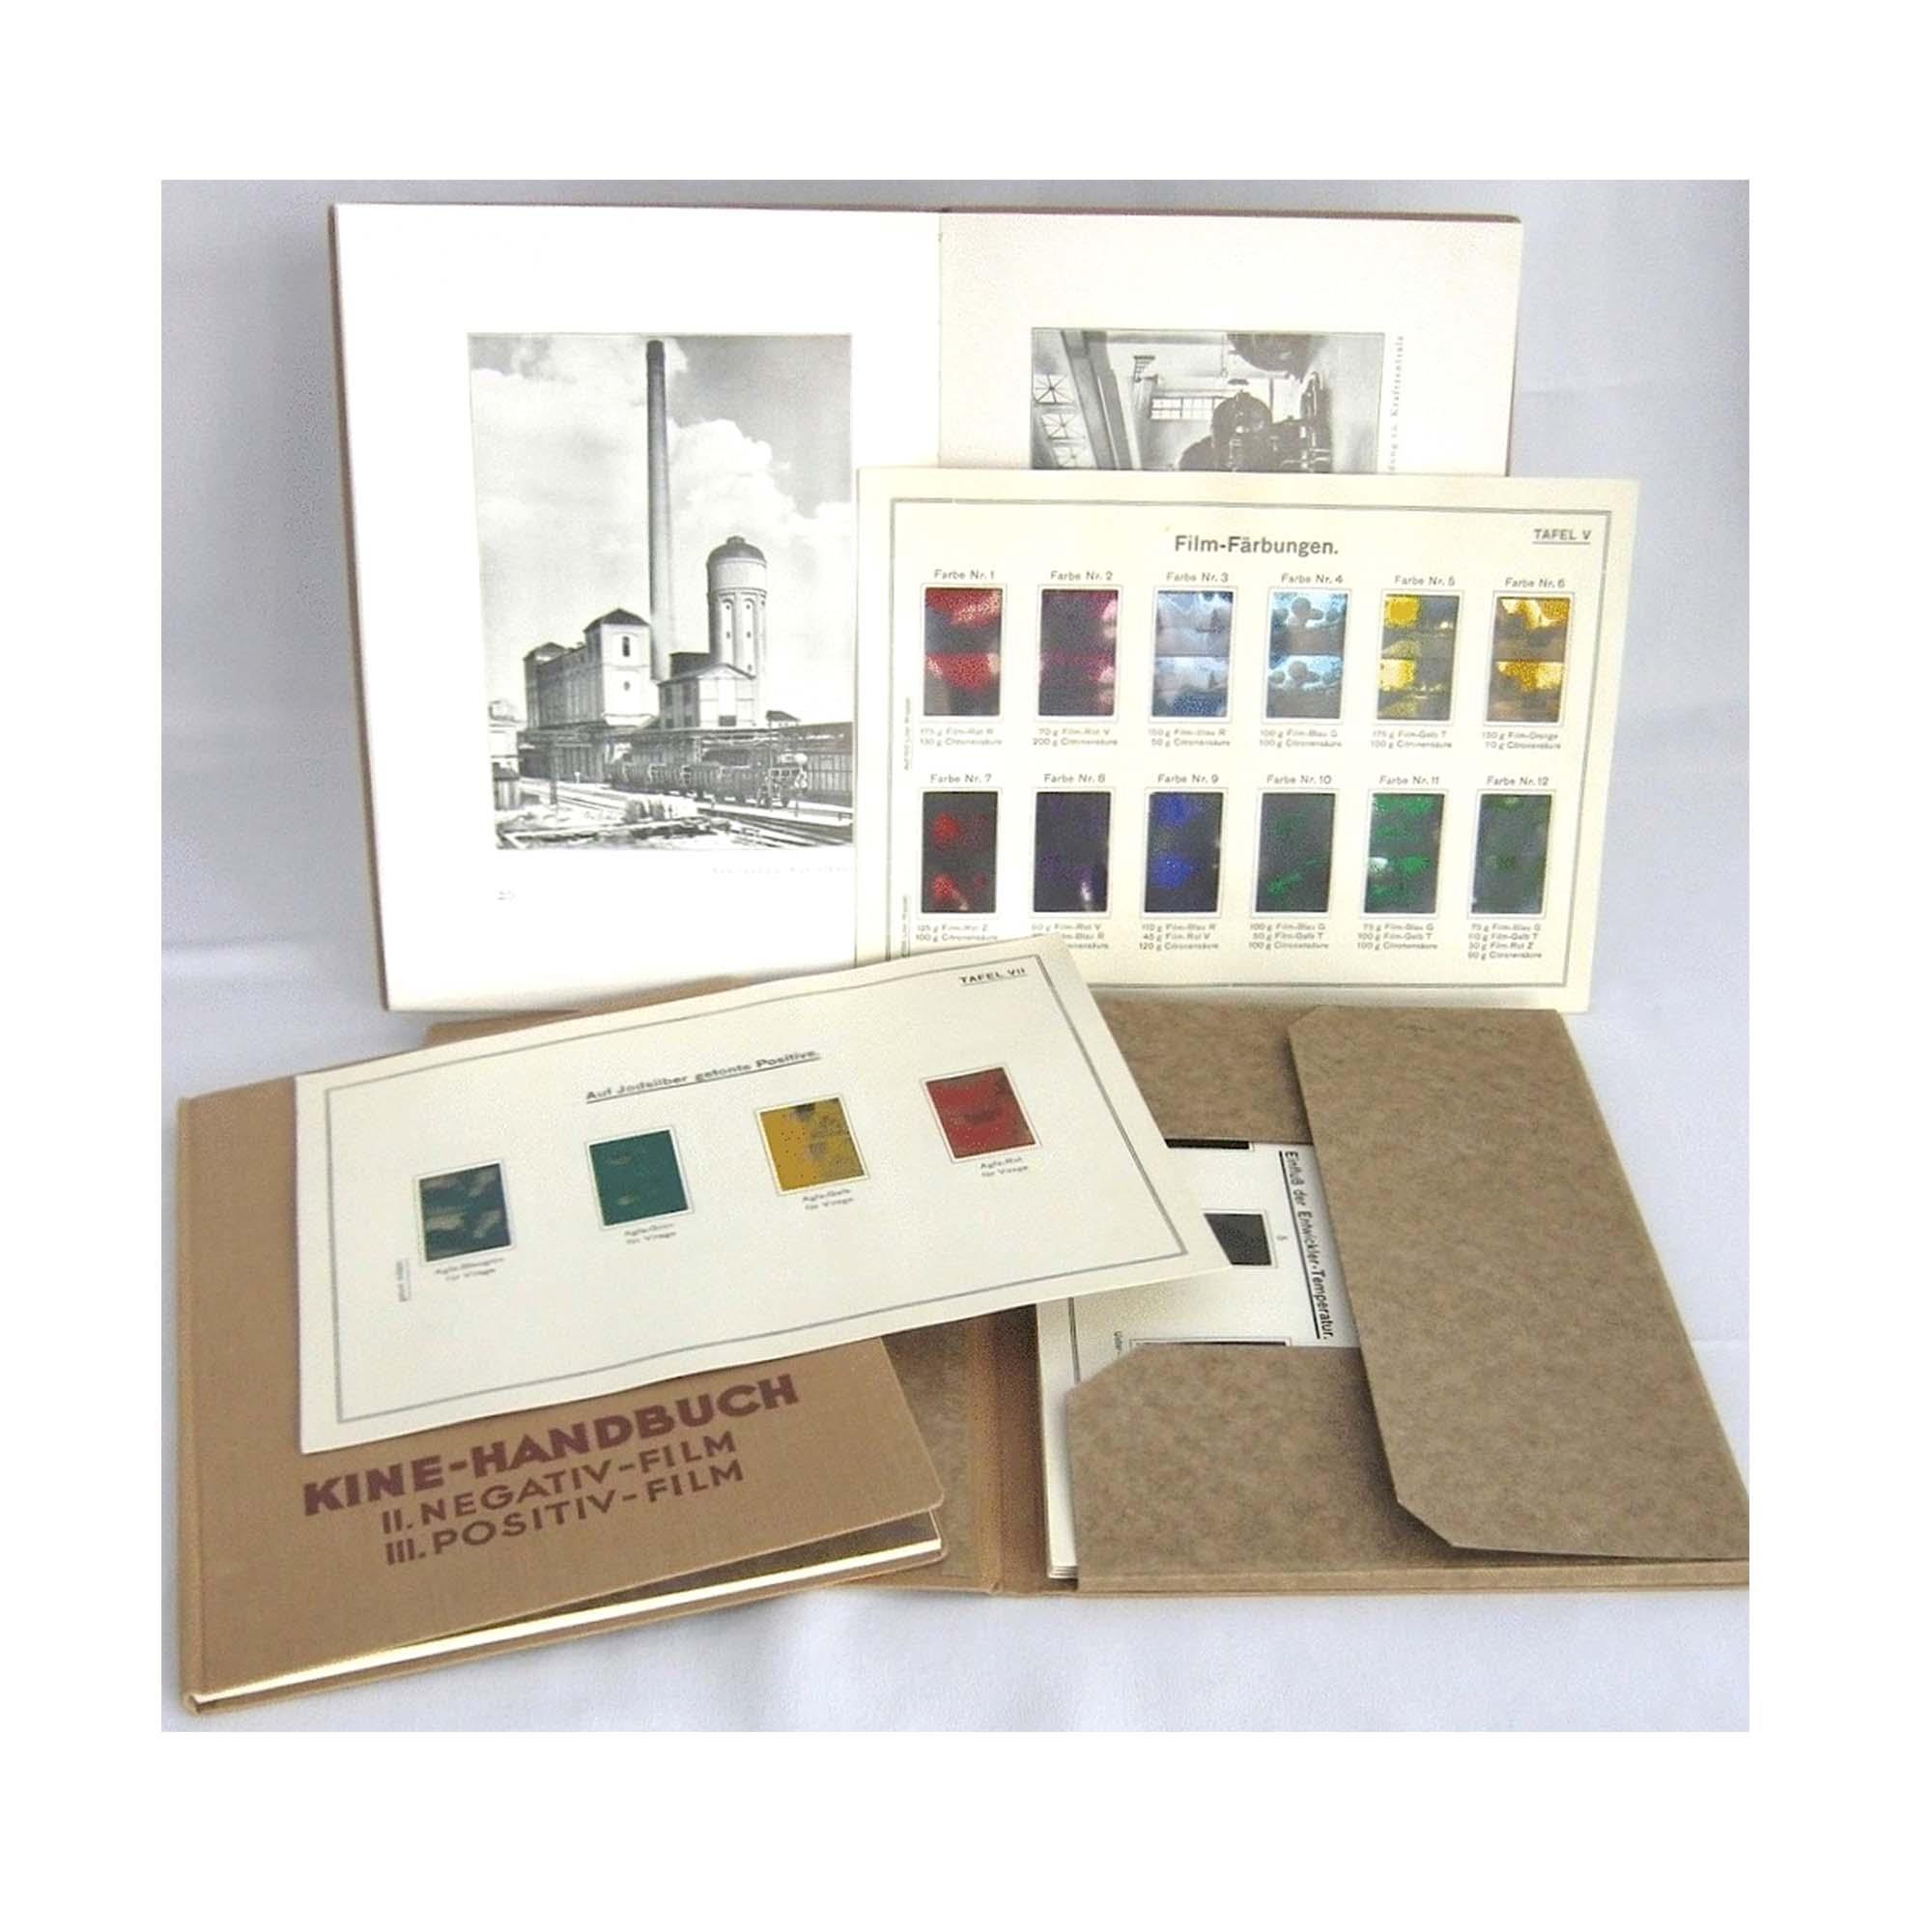 5267-Agfa-Kine-Handbuch-1927-1-N.jpg